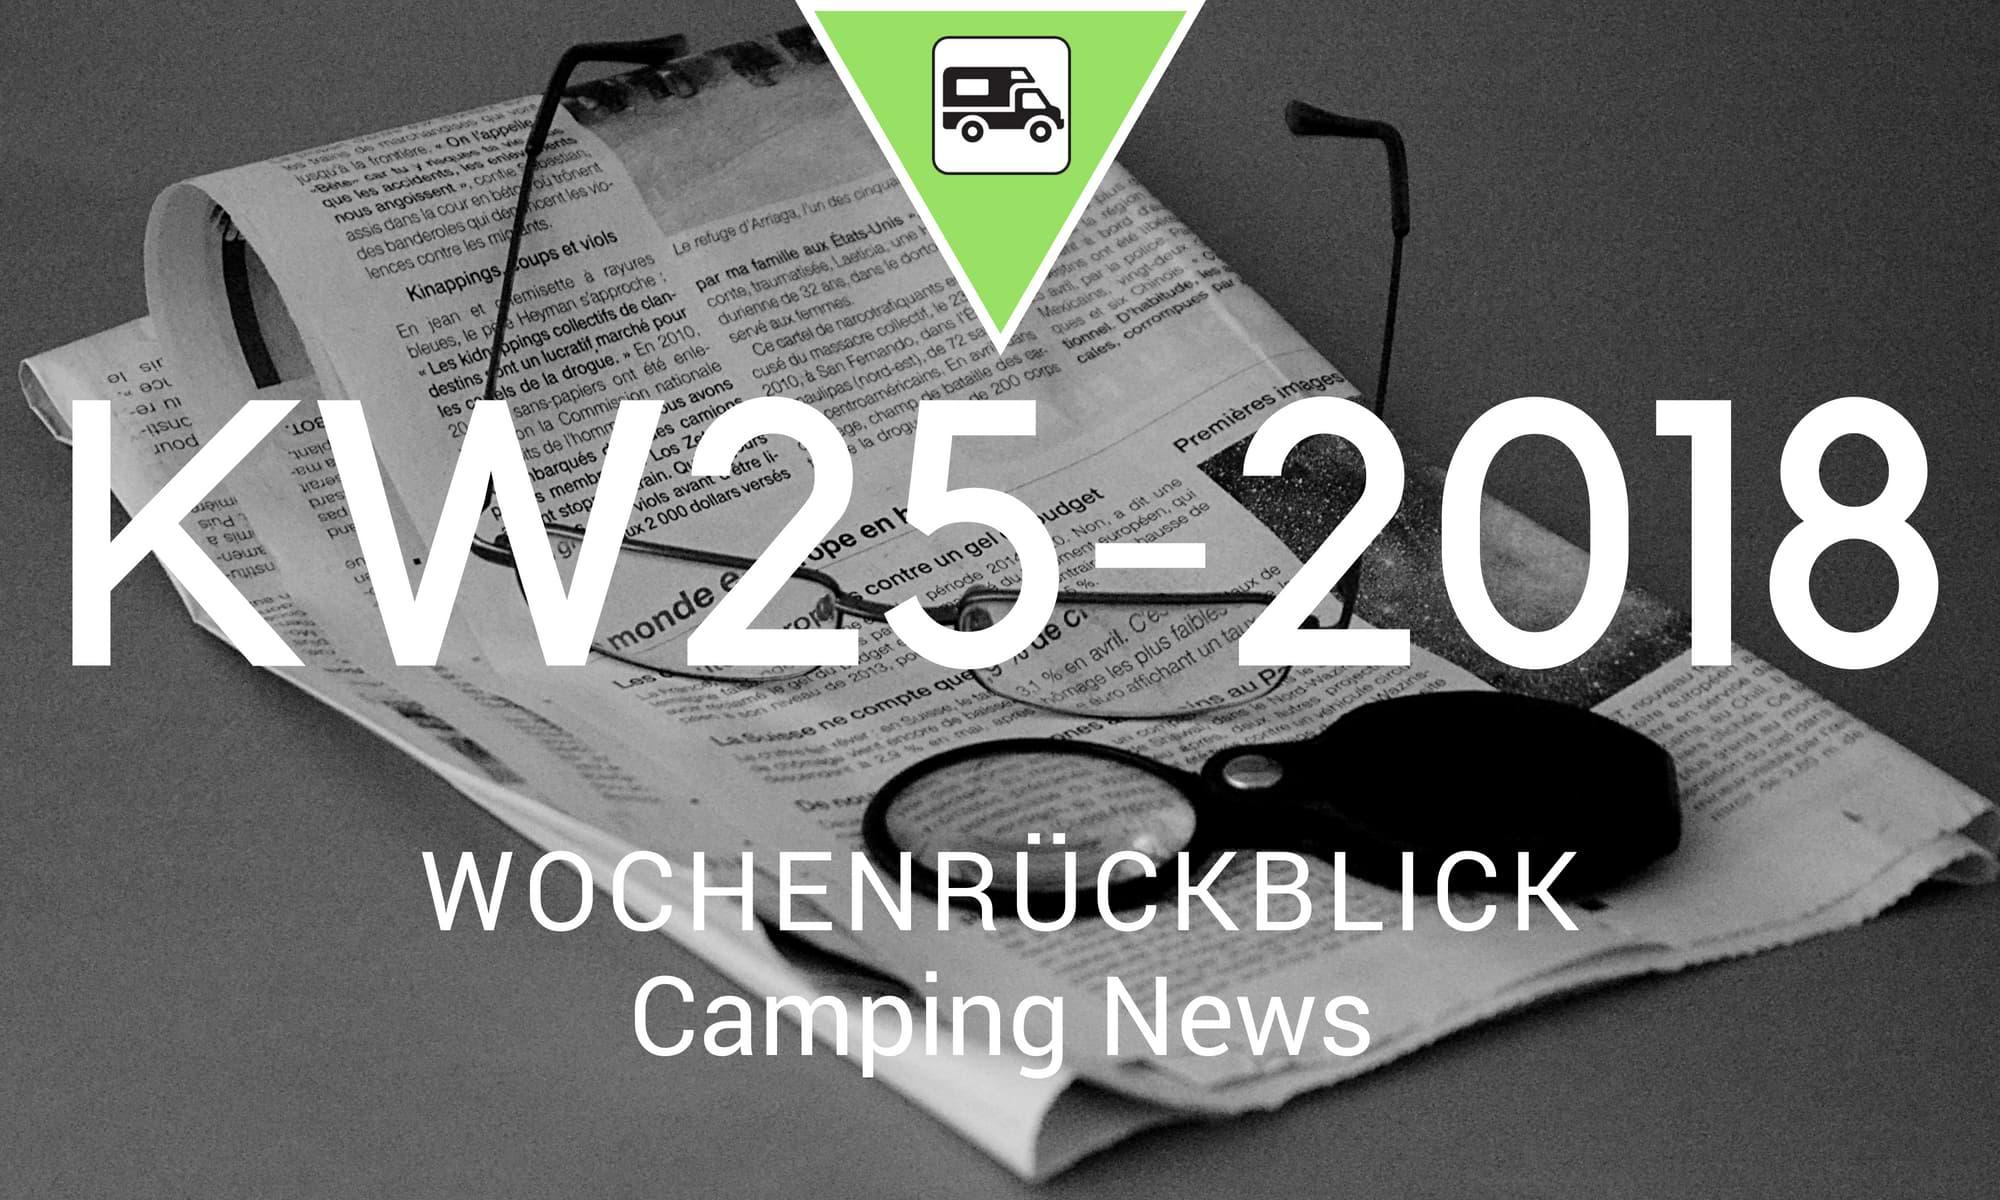 Wochenrückblick Camping News KW25-2018